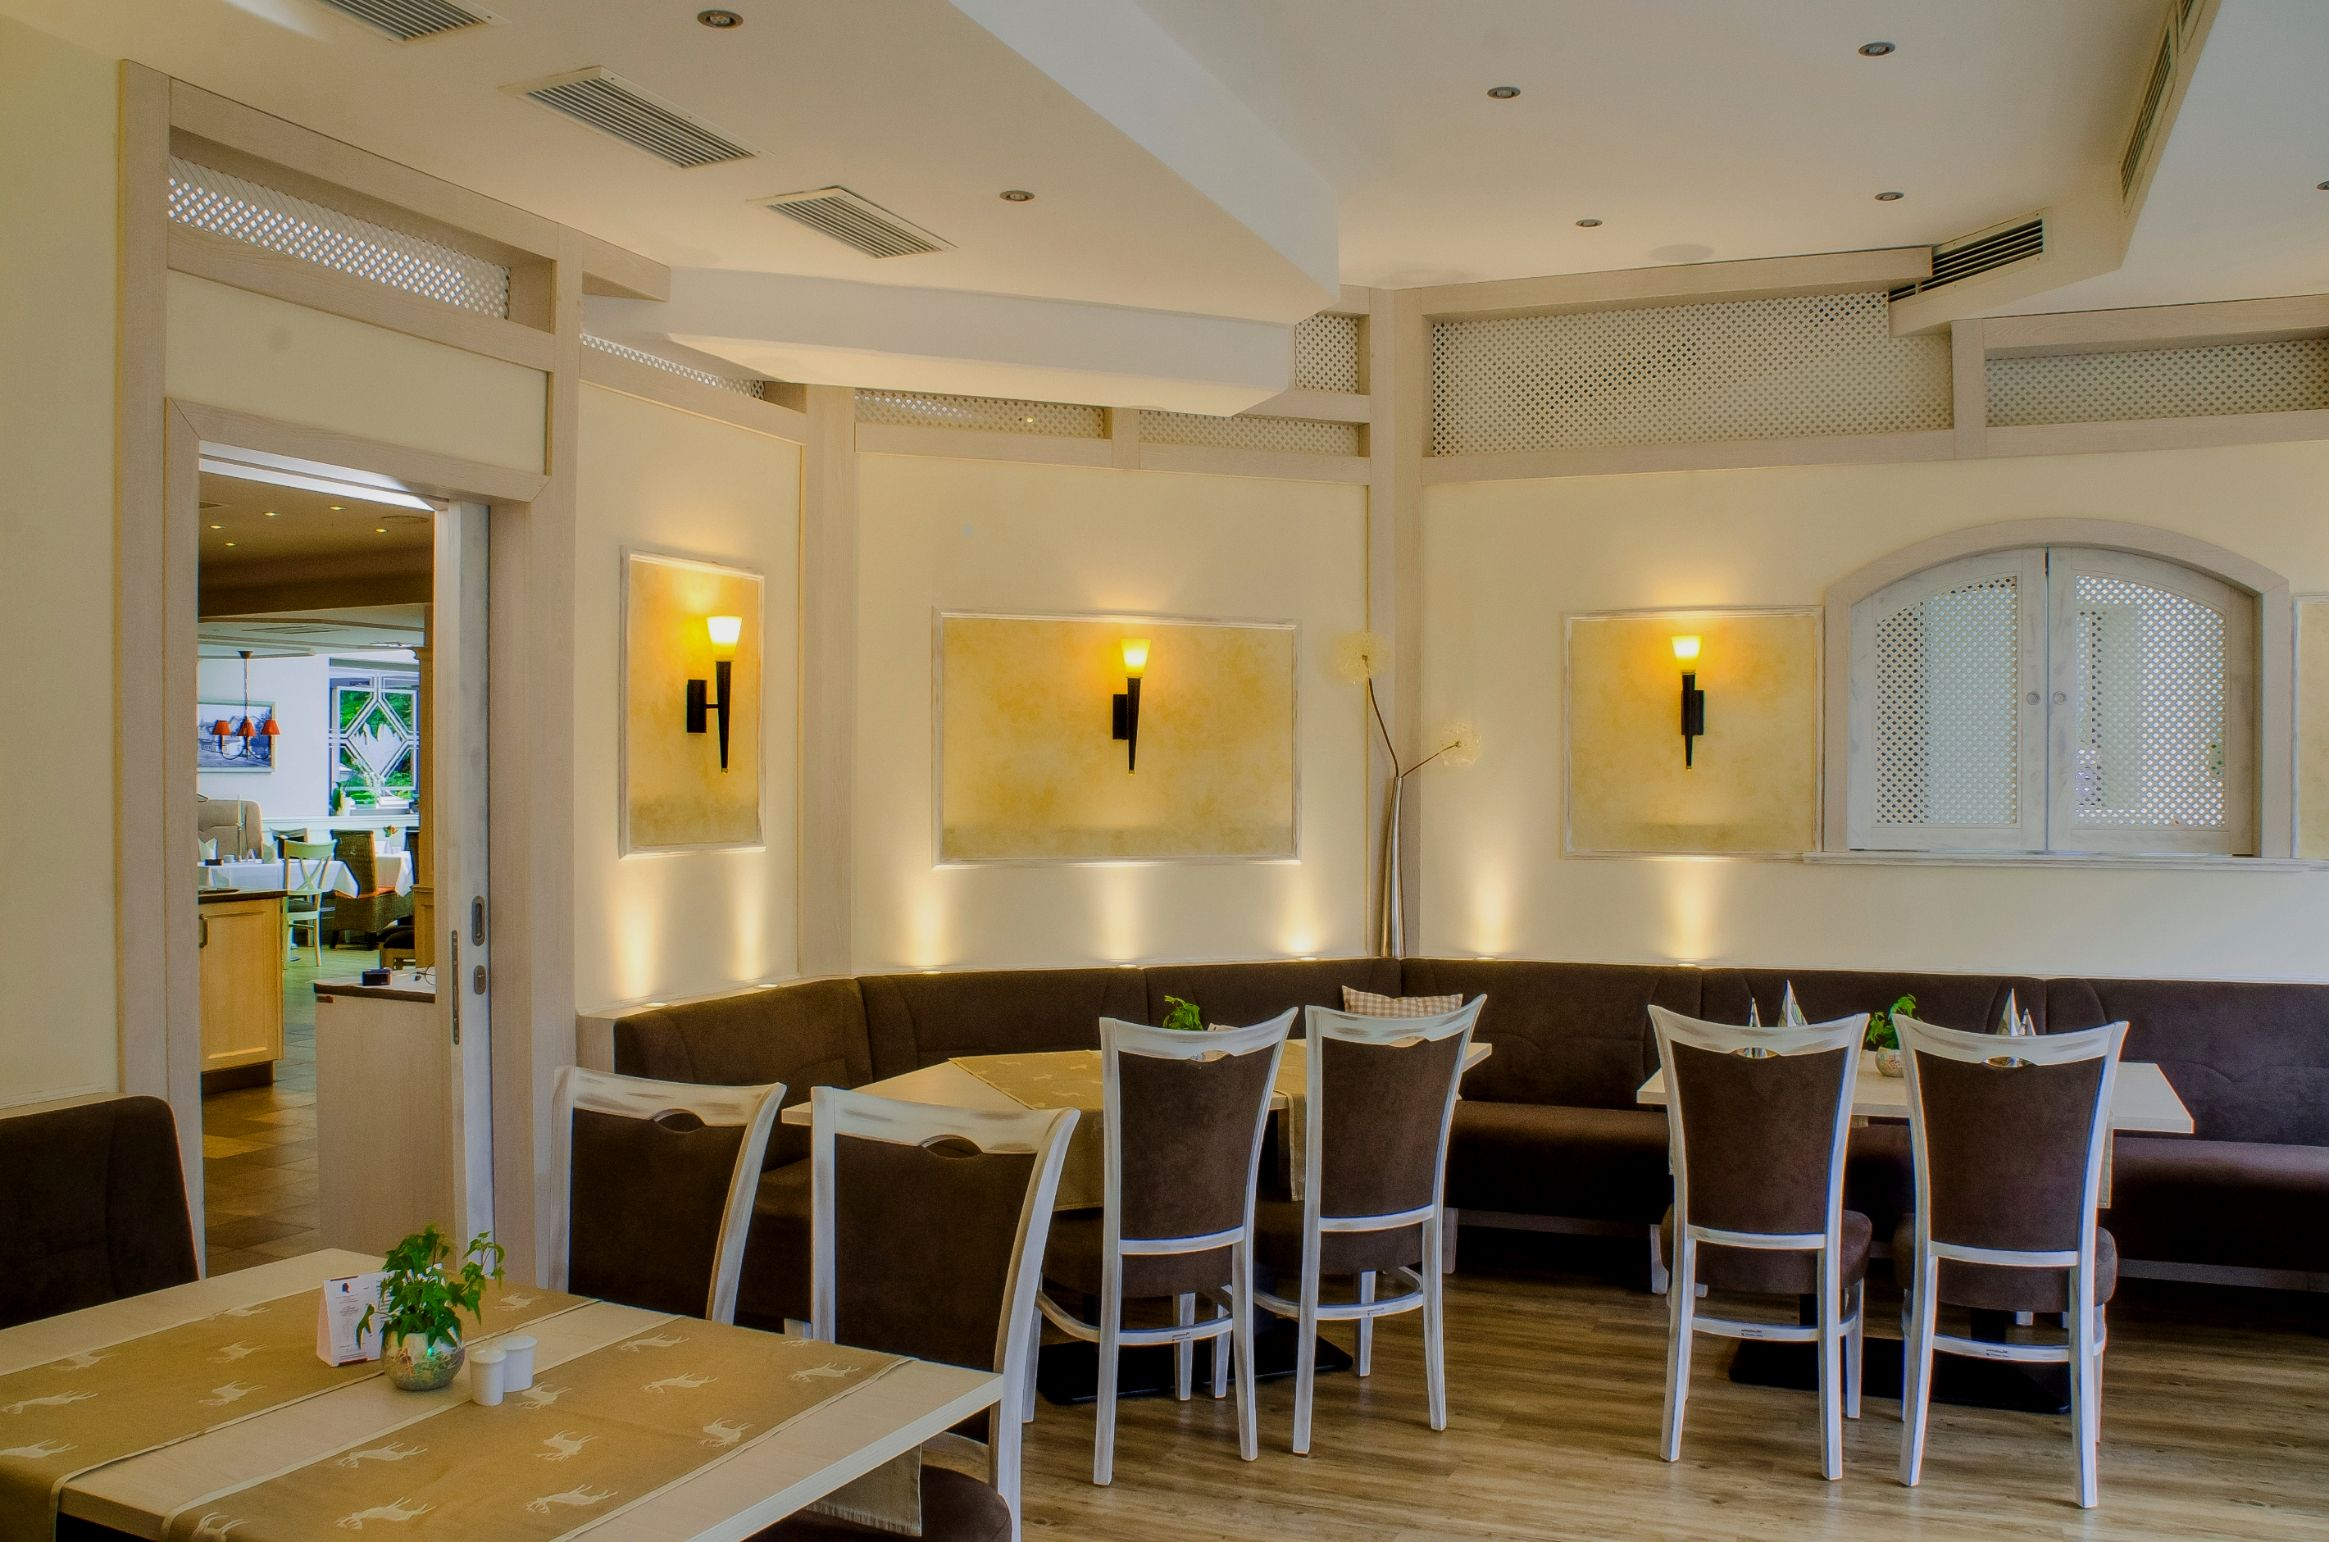 Benders Restaurant